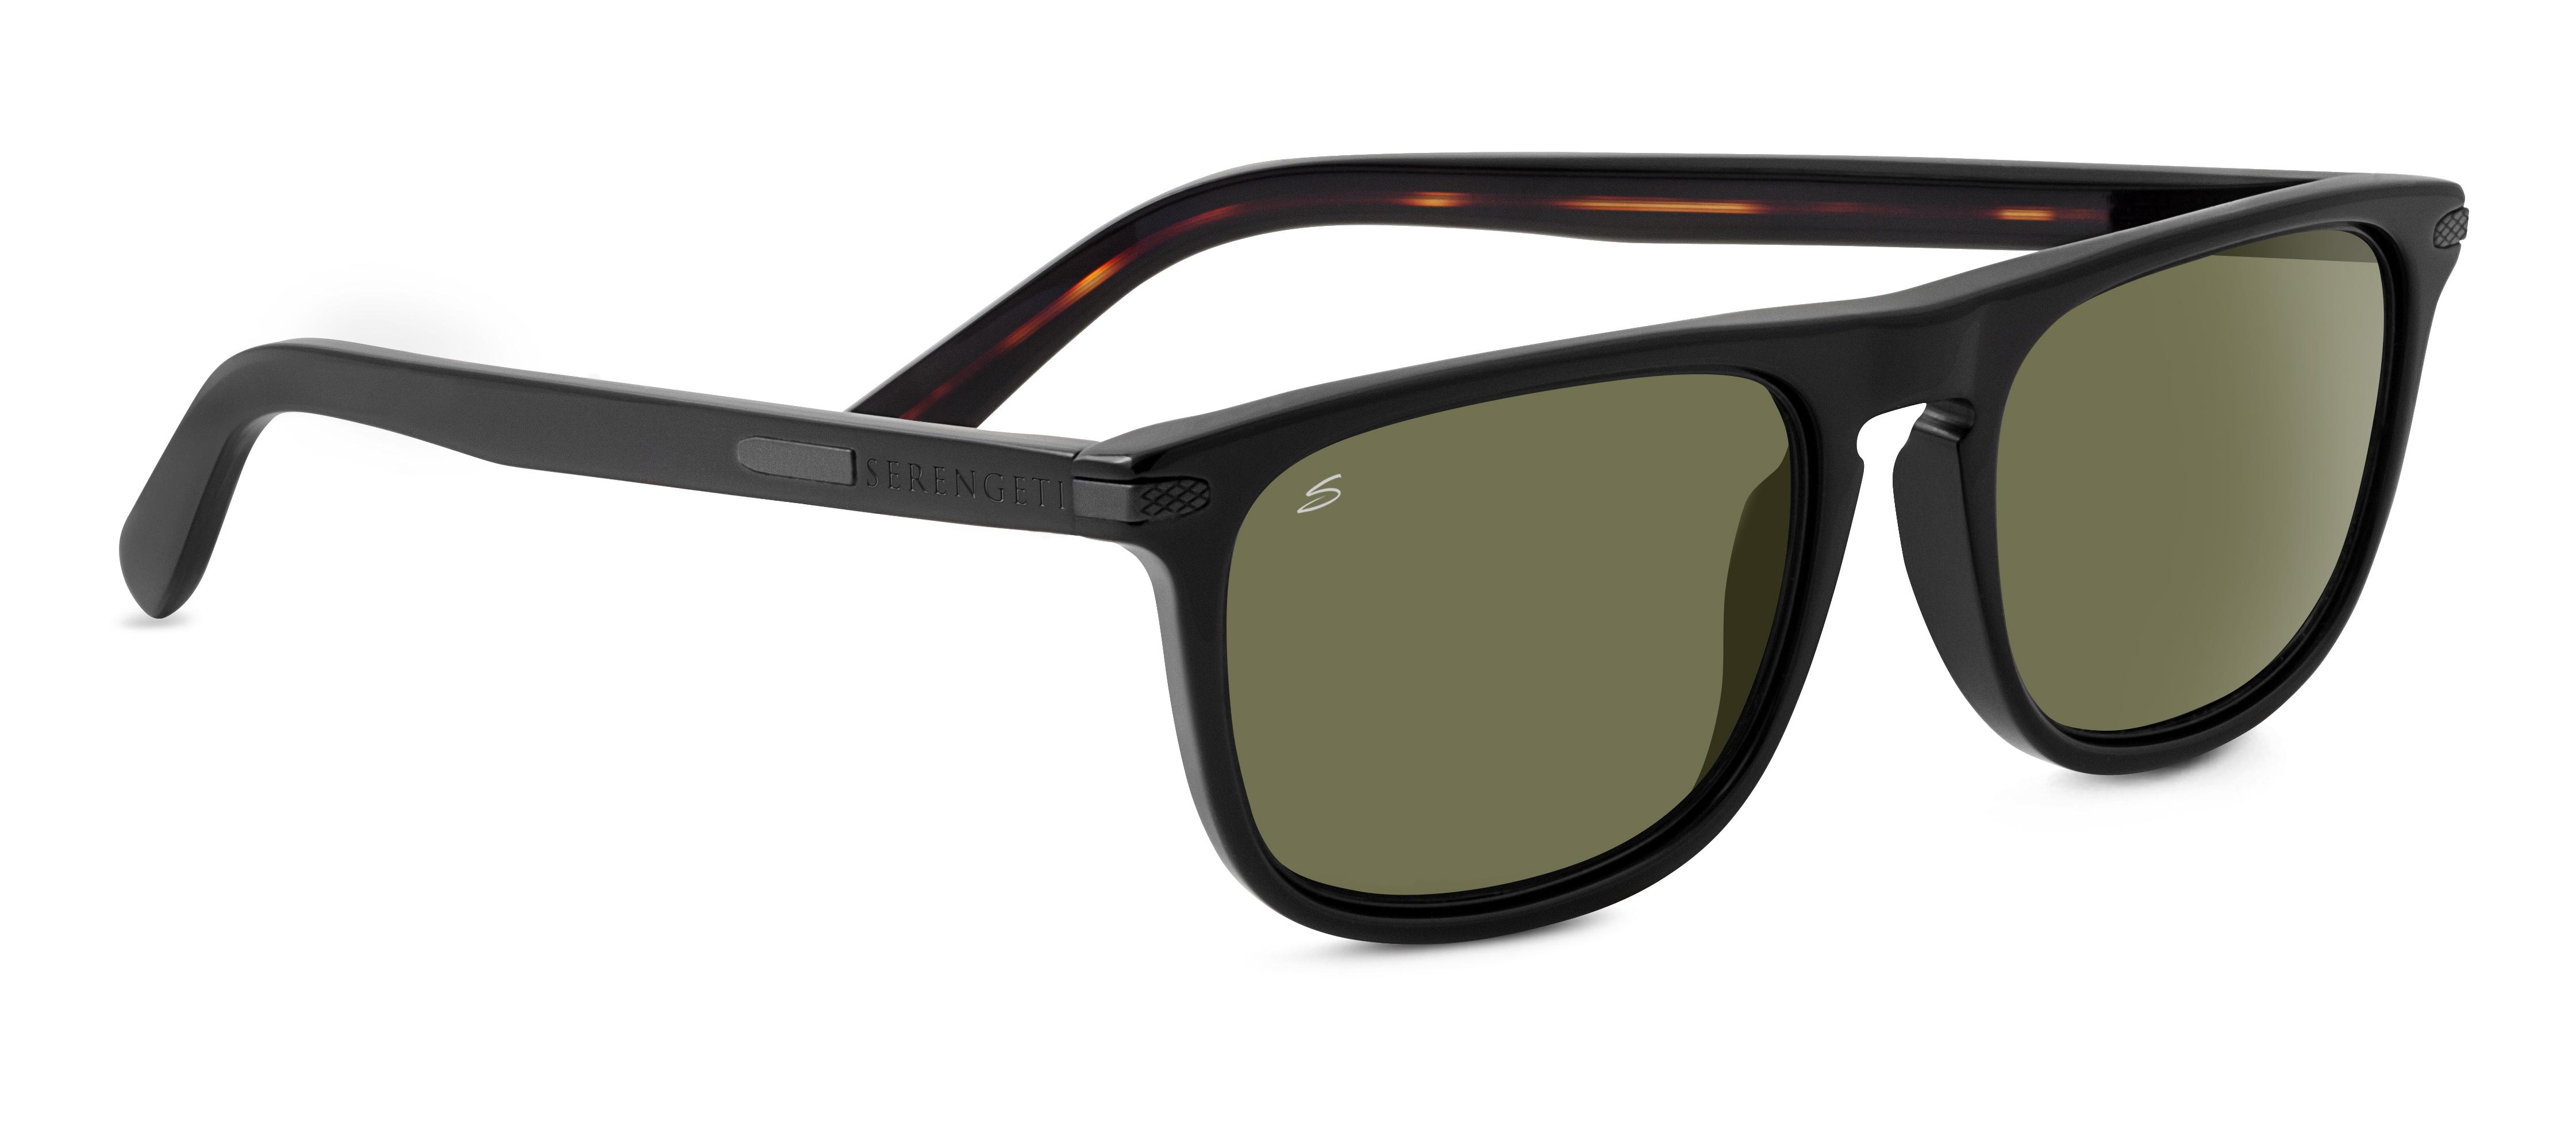 8192fd4b23bd Serengeti Leonardo Sunglasses FREE S H 8154. Serengeti Sunglasses for Men.